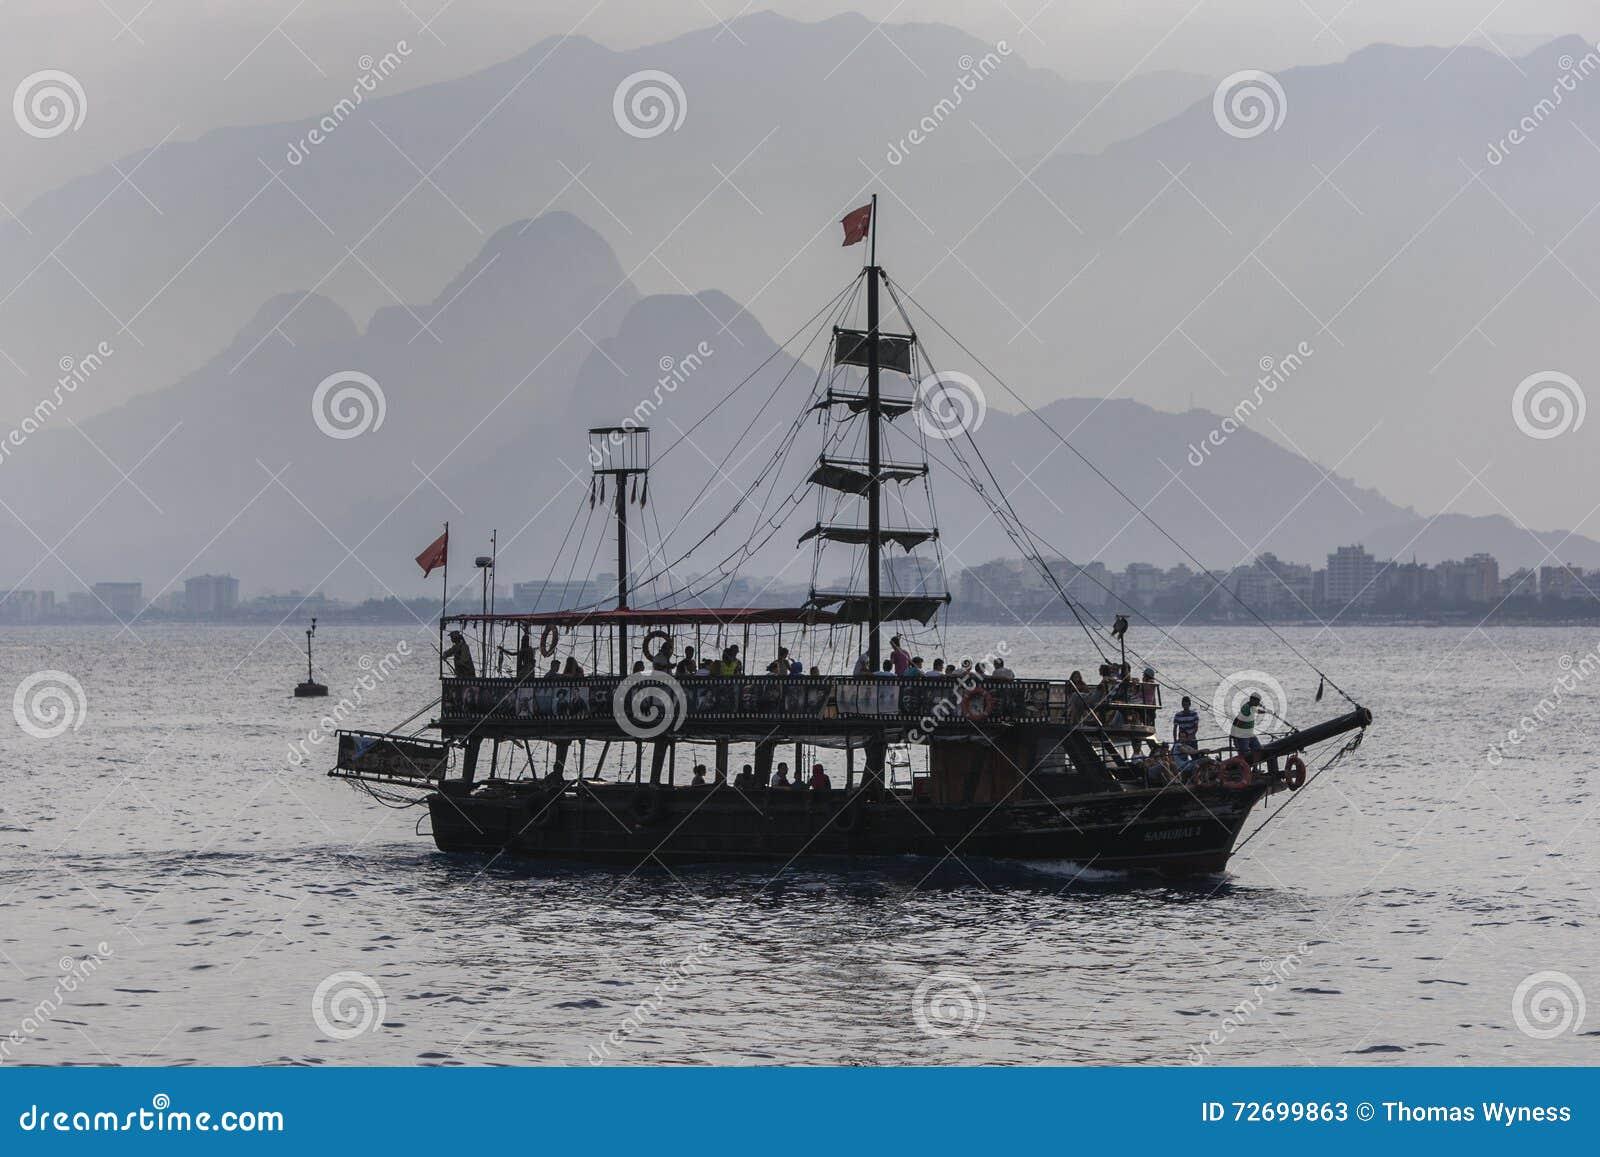 A cruise boat at Antalya in Turkey.